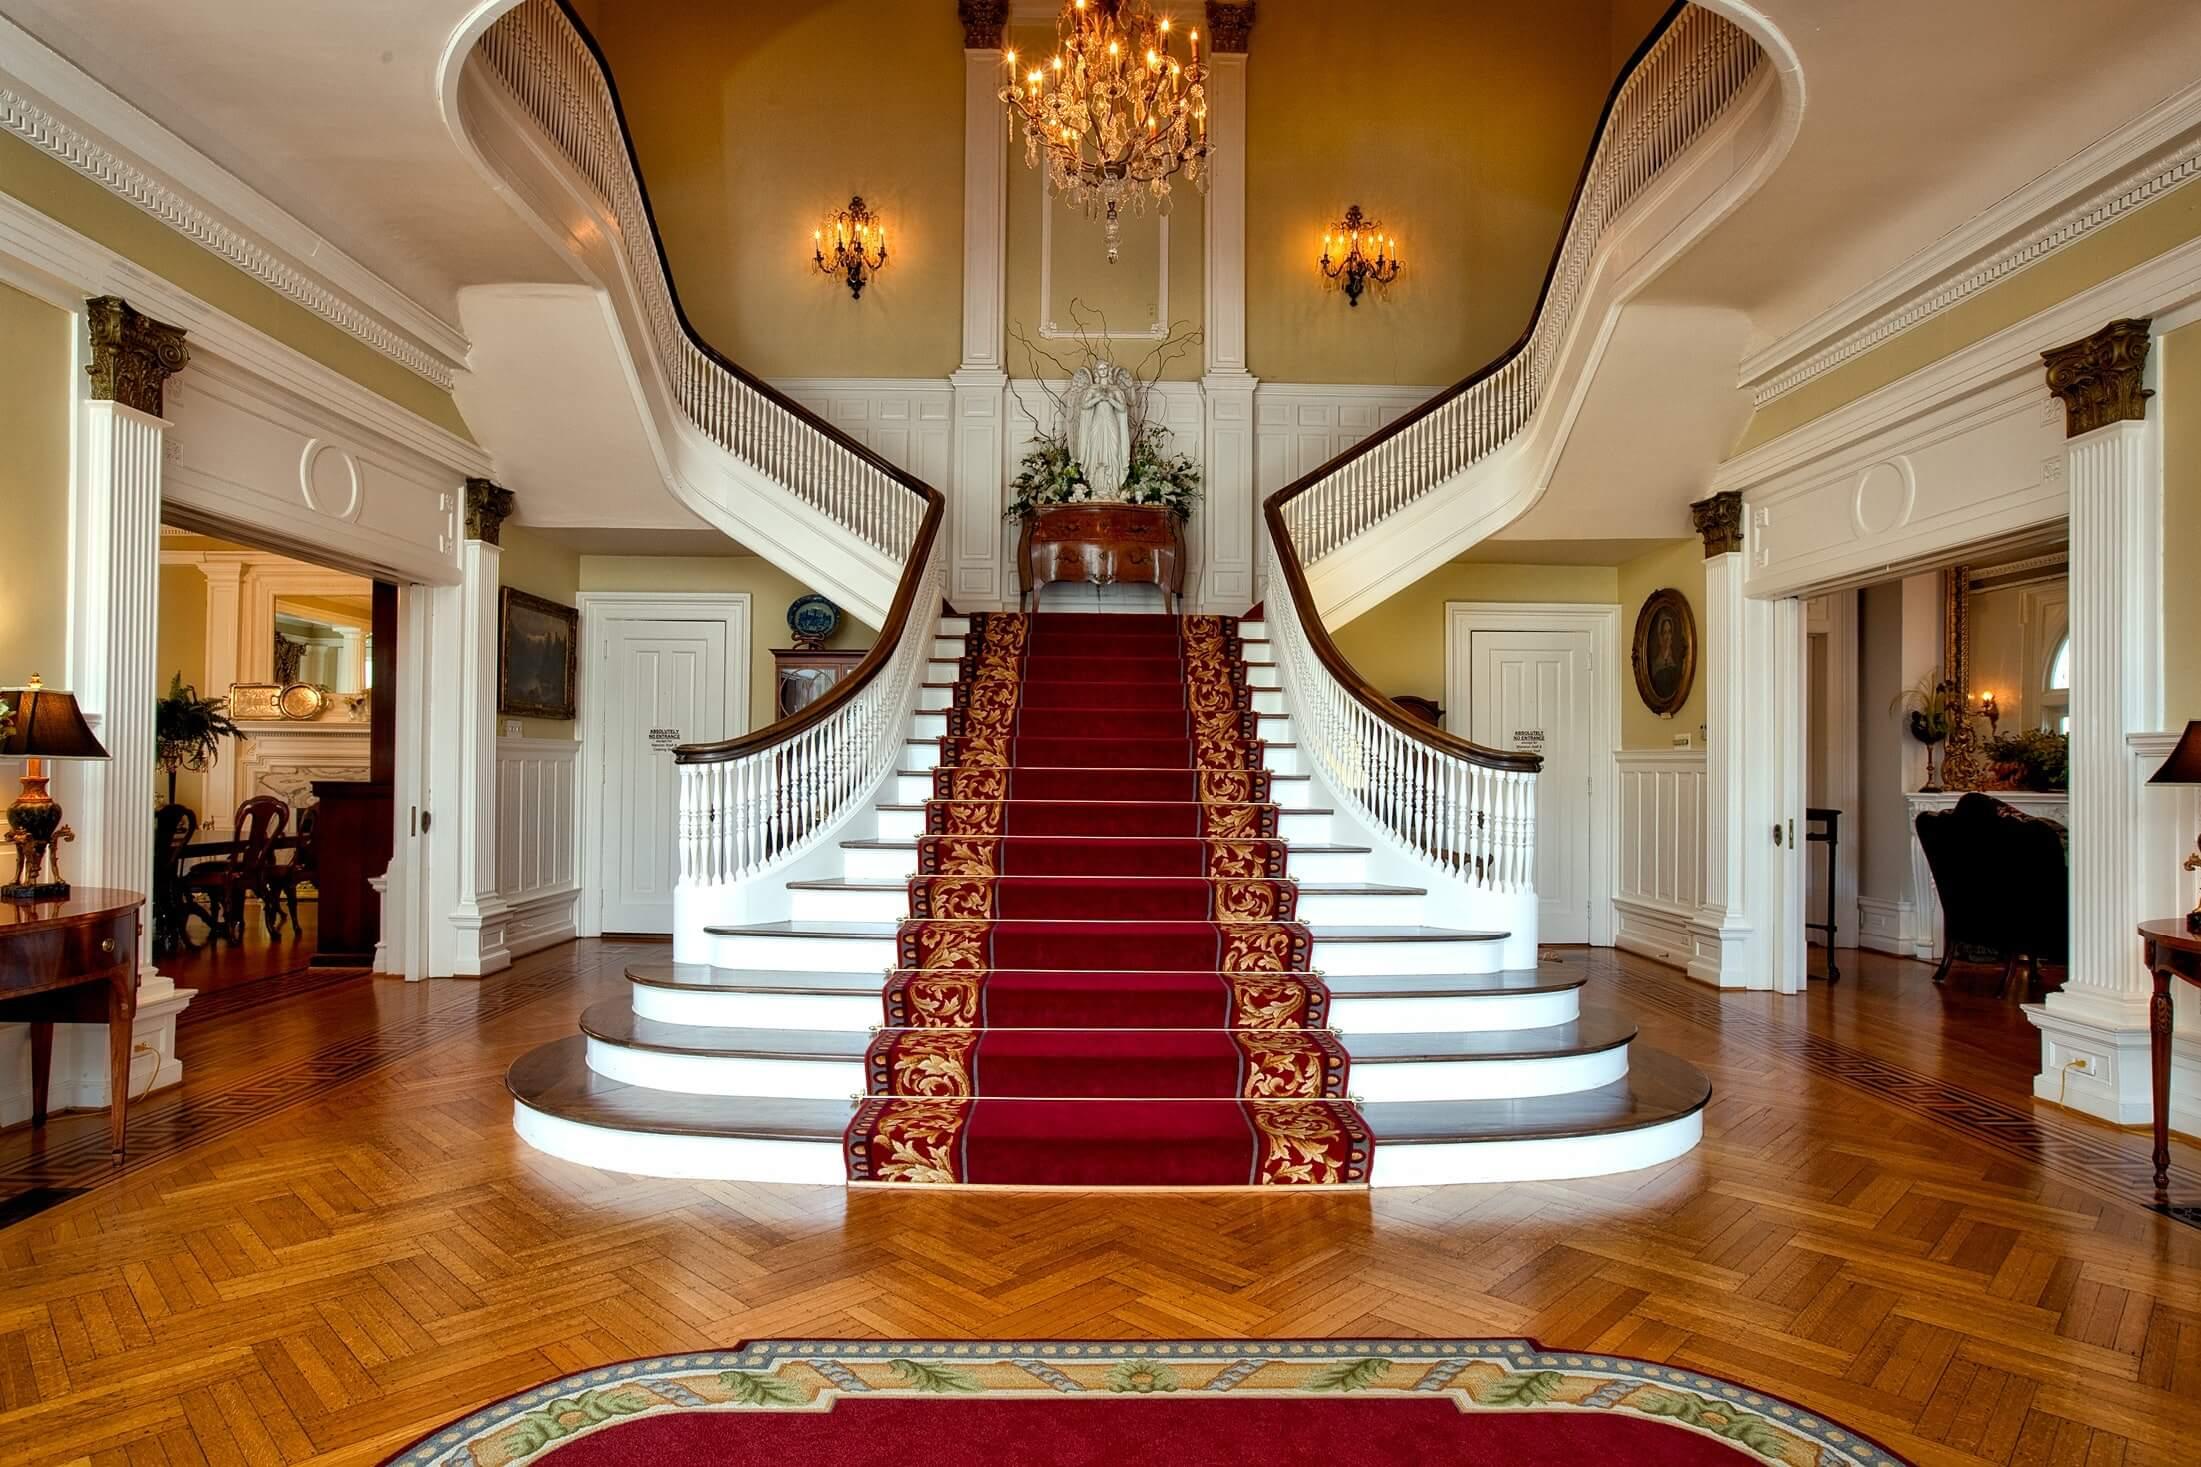 Commercial Interior Design Ideas Best Commercial Interiors Of 2019